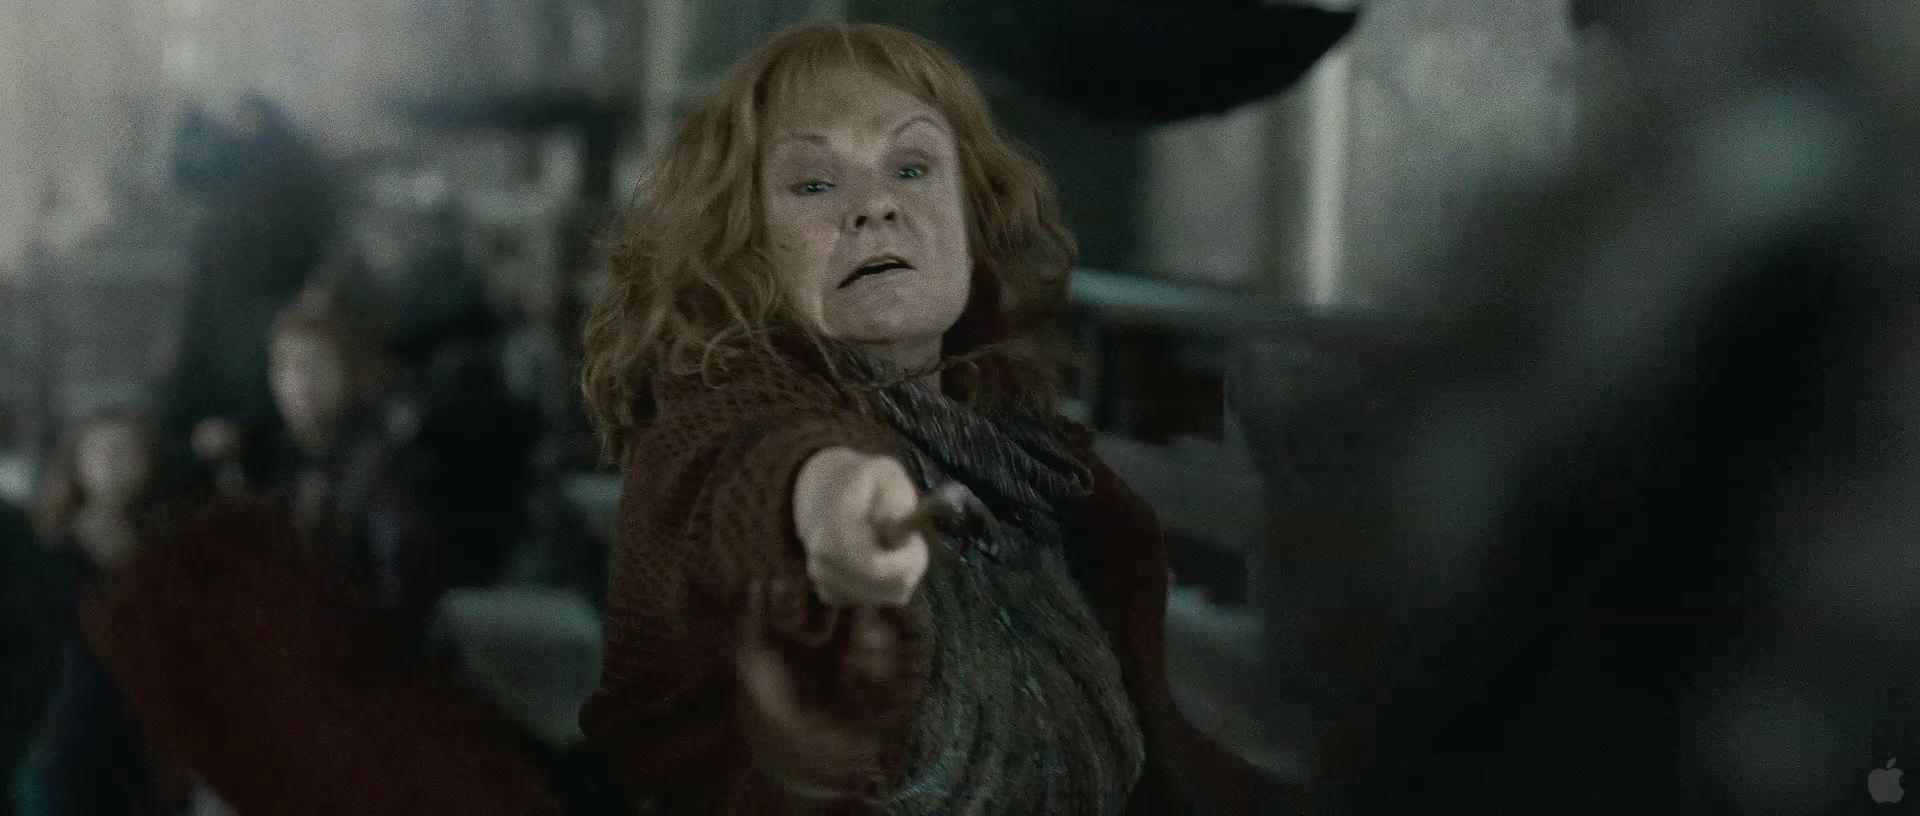 Harry Potter BlogHogwarts HP7 2 Trailer 78